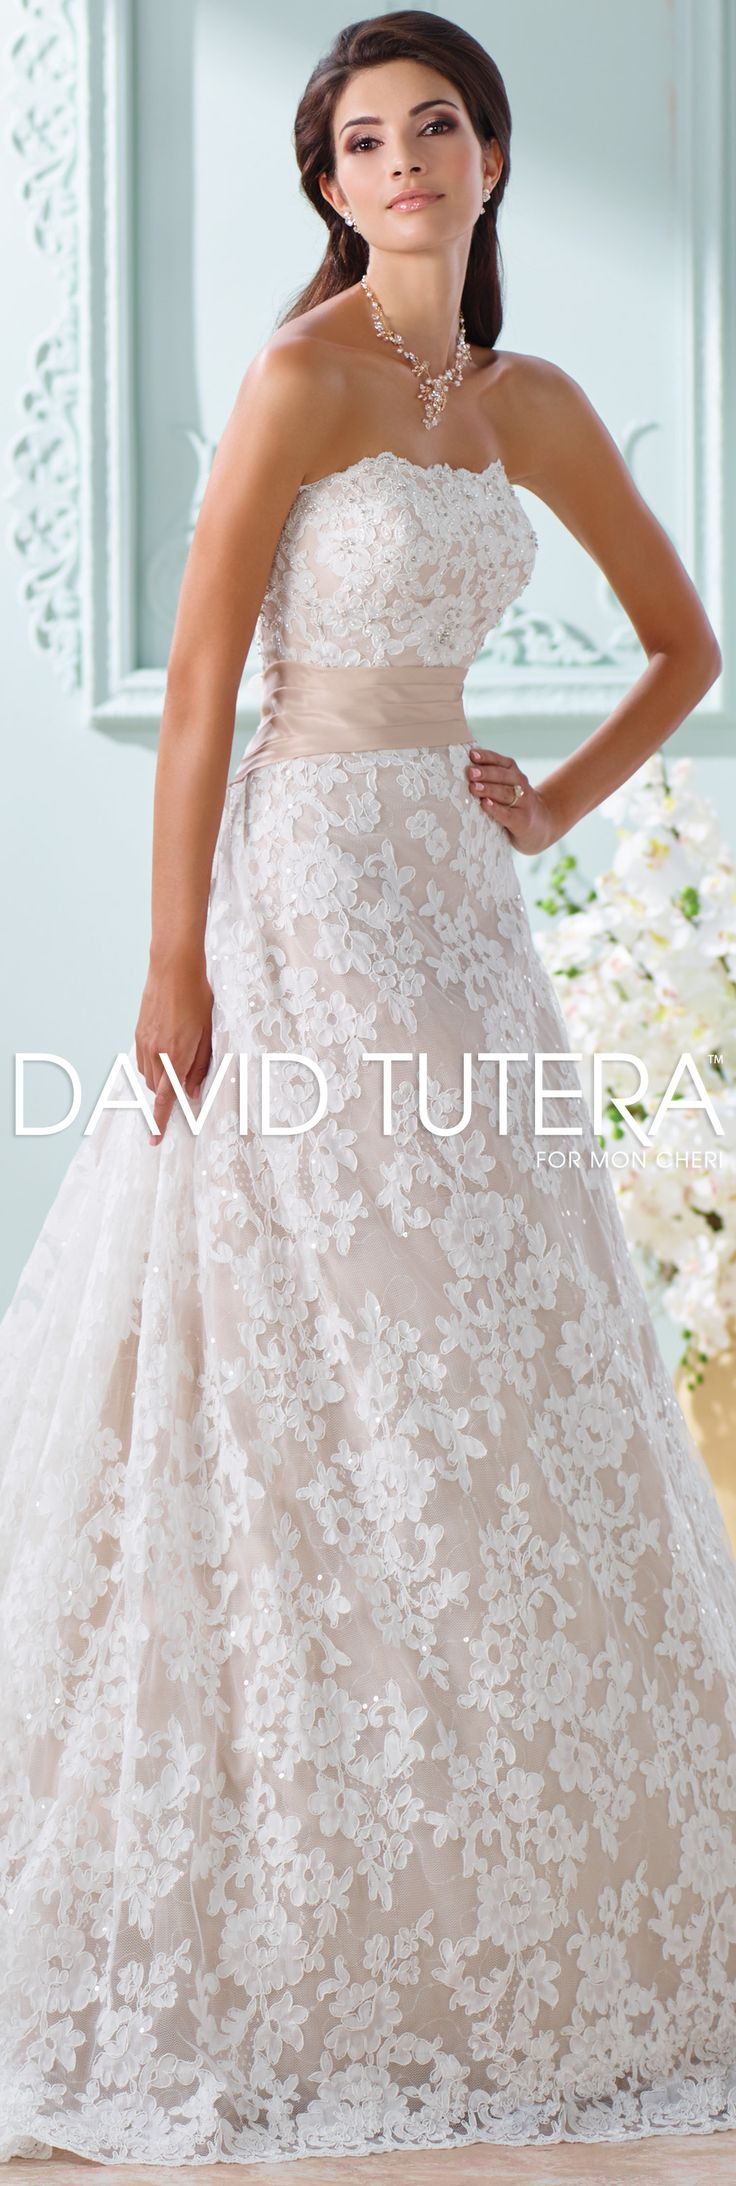 The David Tutera for Mon Cheri Spring 2016 Wedding Gown Collection - Style No. 116219 Yalene #laceweddingdresses